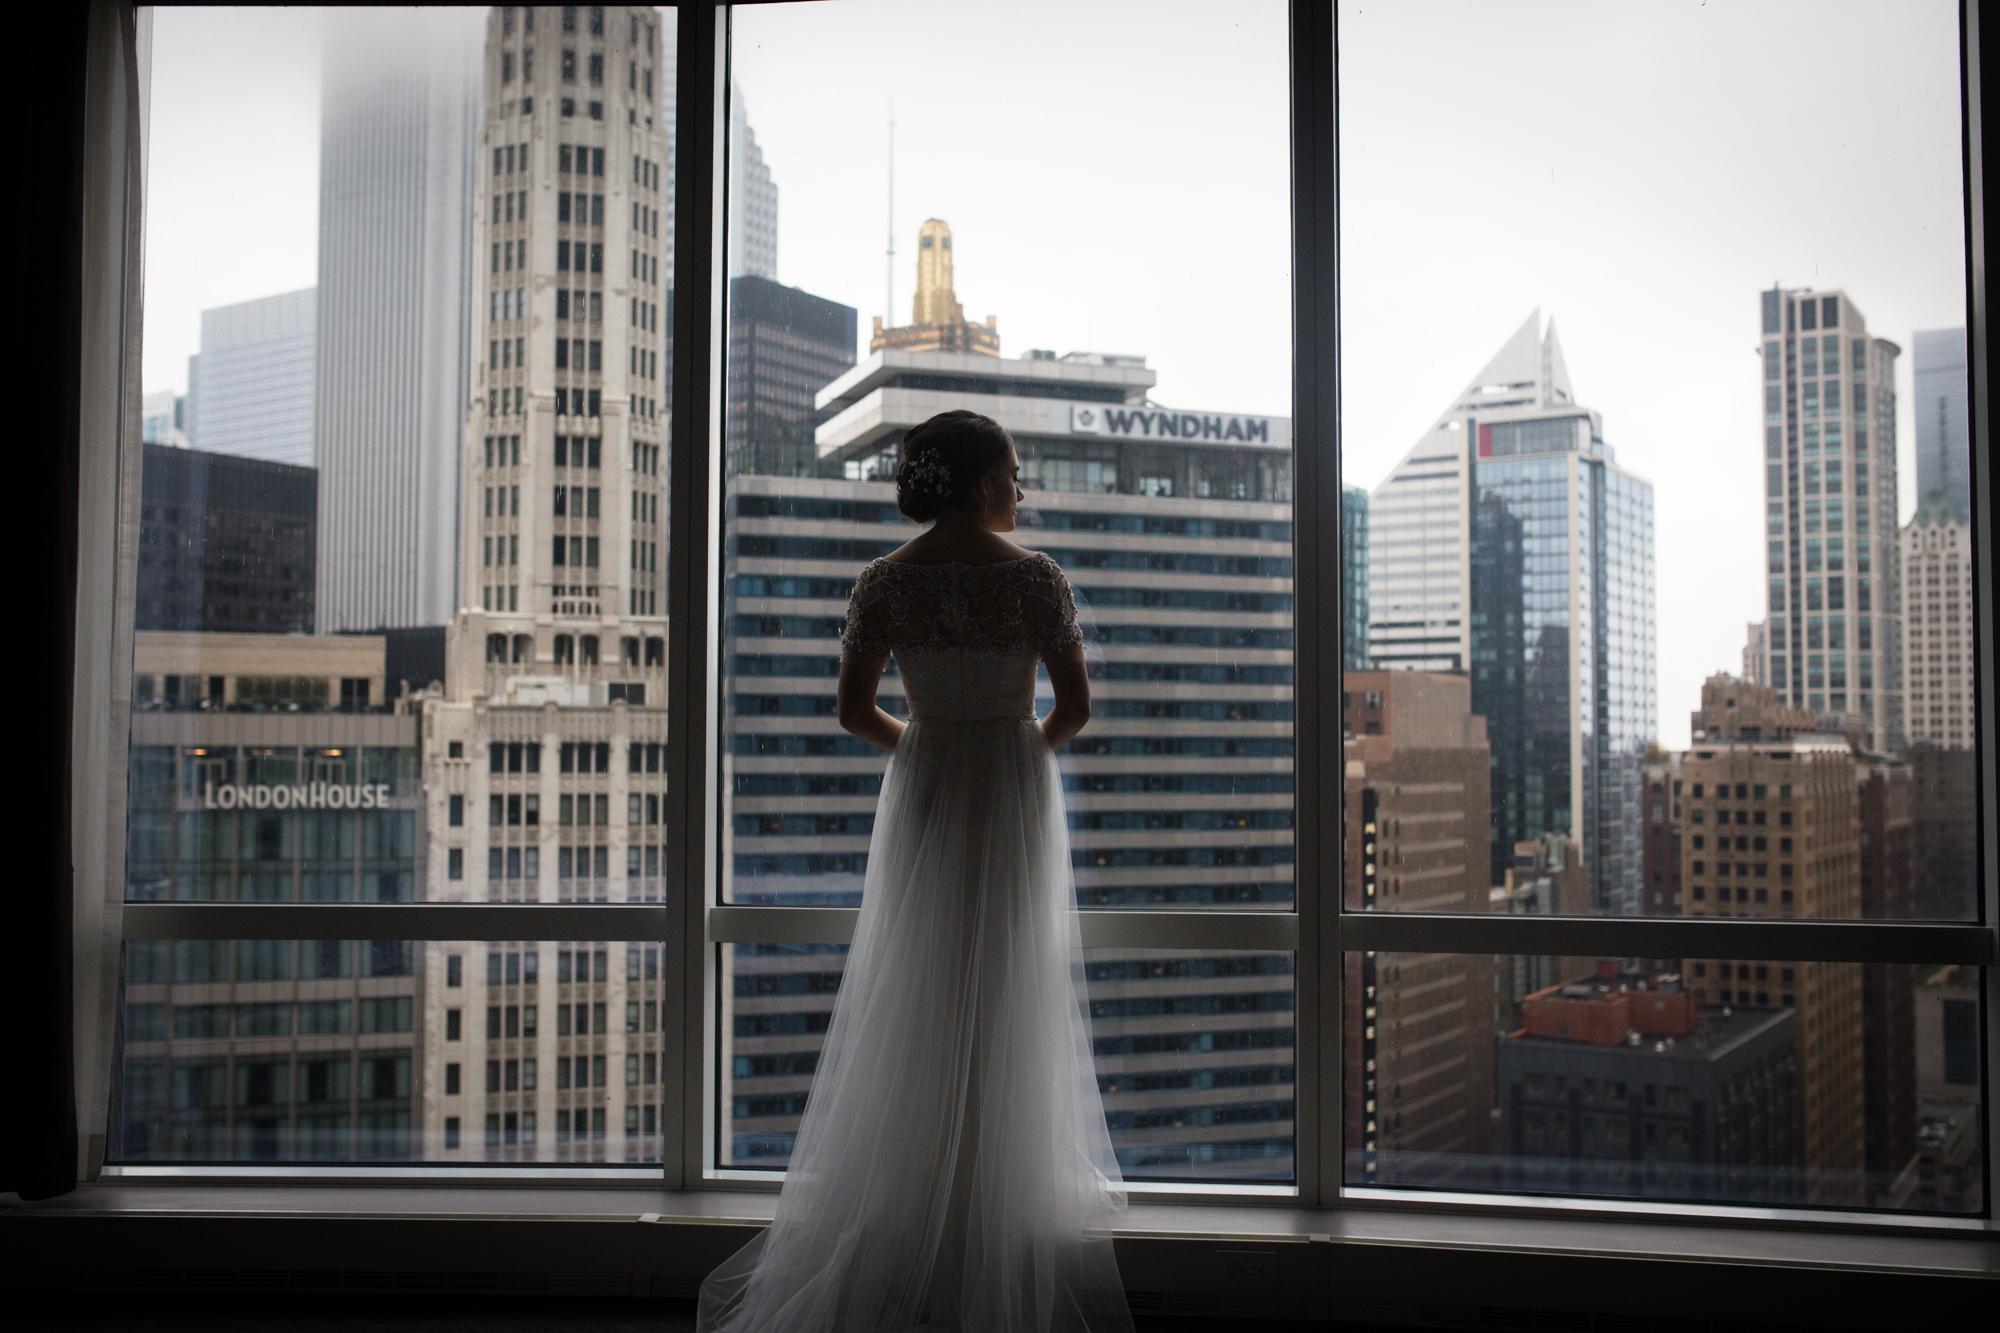 Bridal silhouette against Chicago skyline